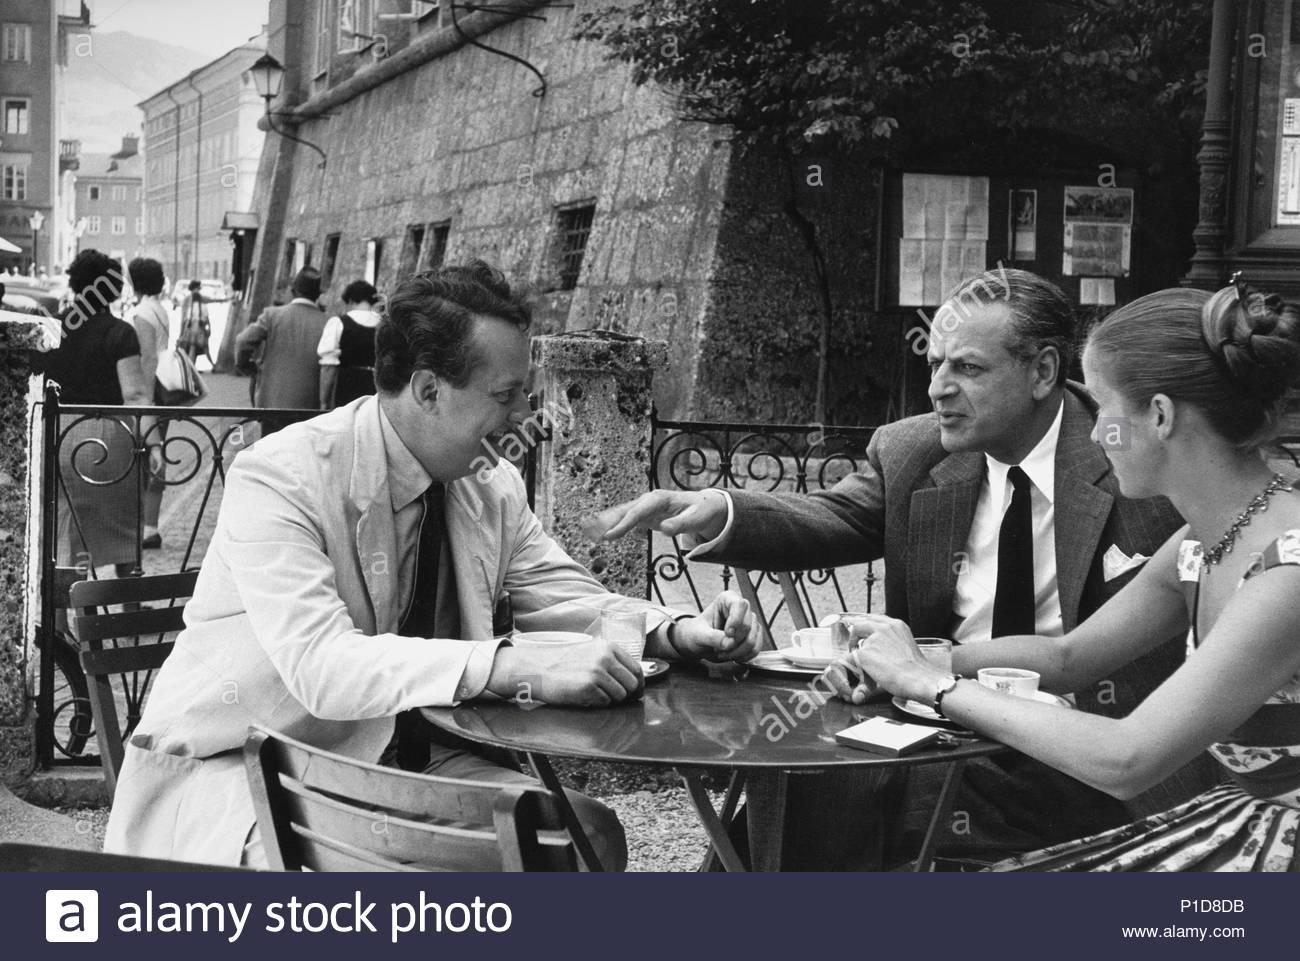 Composer Gottfried von Einem,his wife Lianne and   composer Rolf Liebermann,later director of the   Paris Opera Garnier,in the Cafe Tomaselli during the   Salzburg Festival 1956. Location: Townscape, Salzburg, Austria. - Stock Image